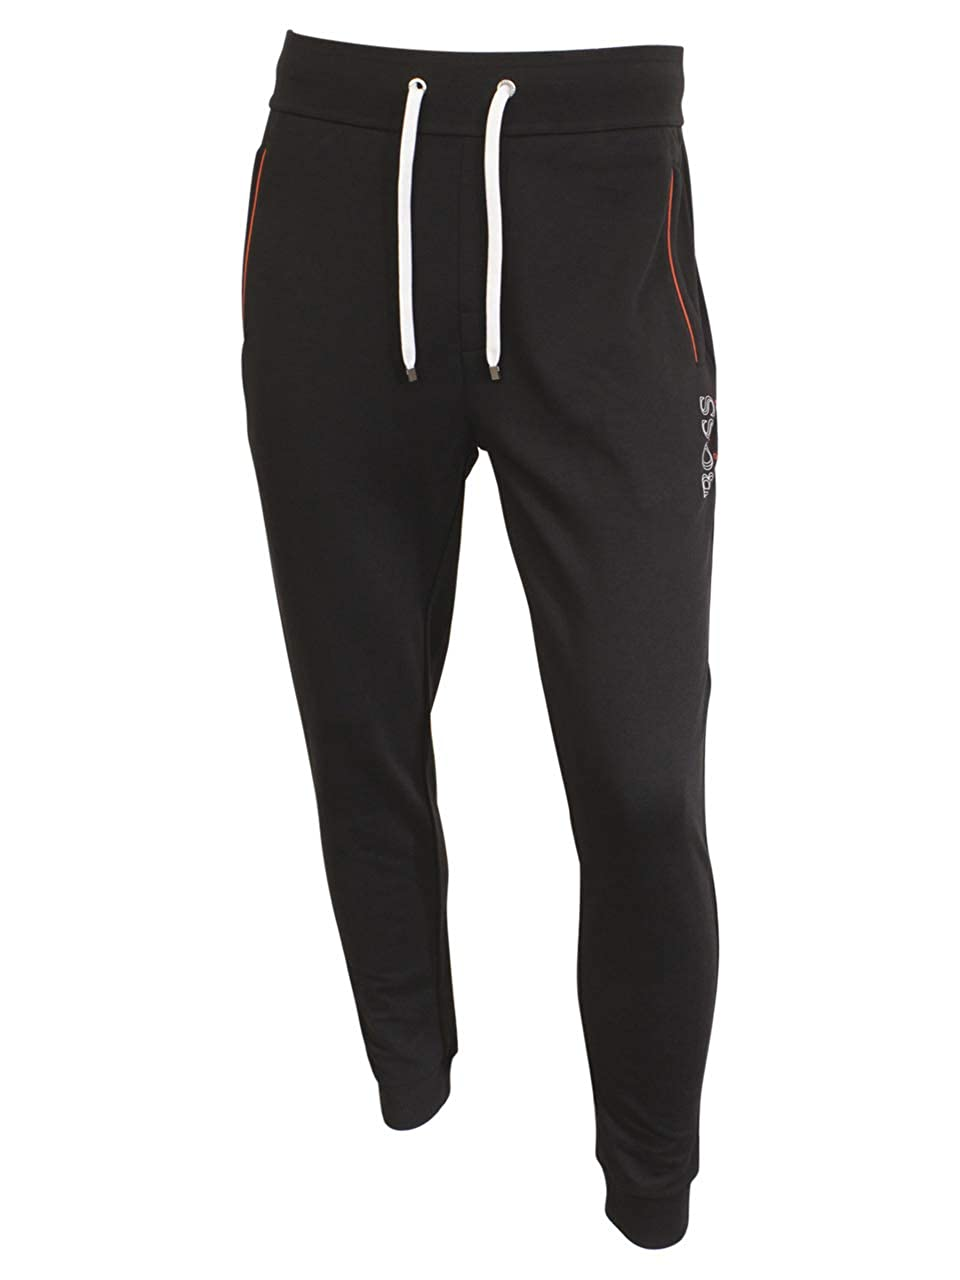 Hugo Boss Mens Tracksuit Cuffed Lounge Pants